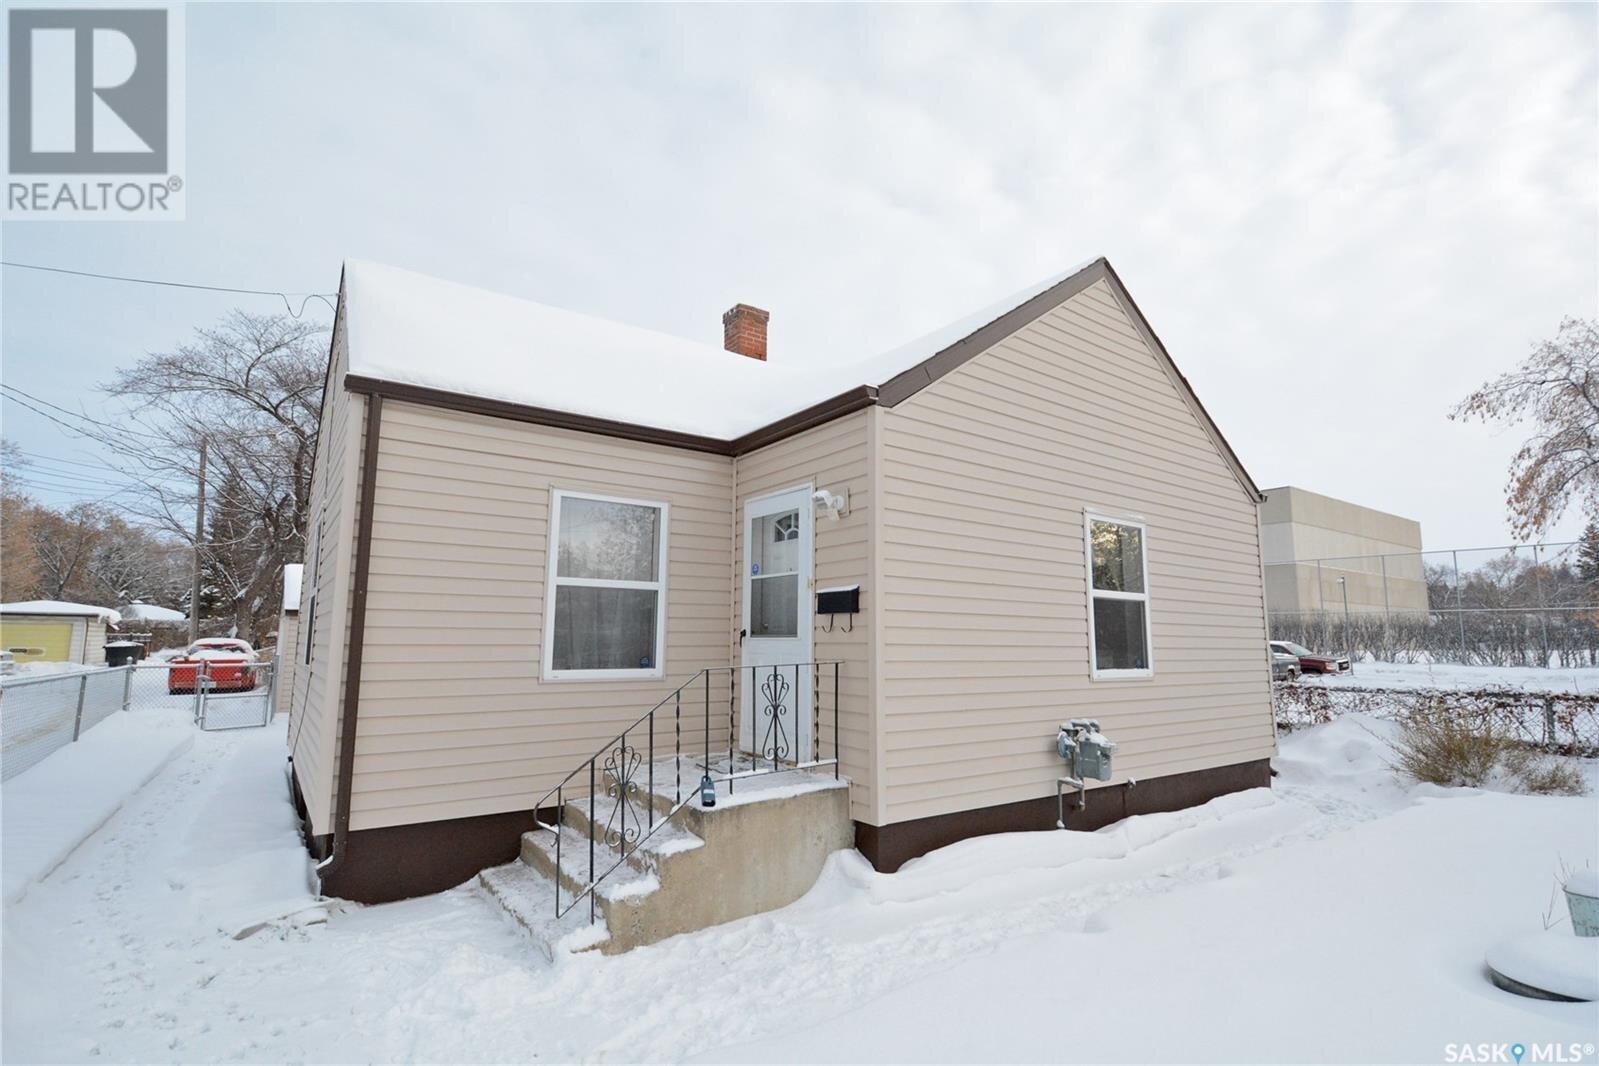 House for sale at 1318 6th Ave W Prince Albert Saskatchewan - MLS: SK834567